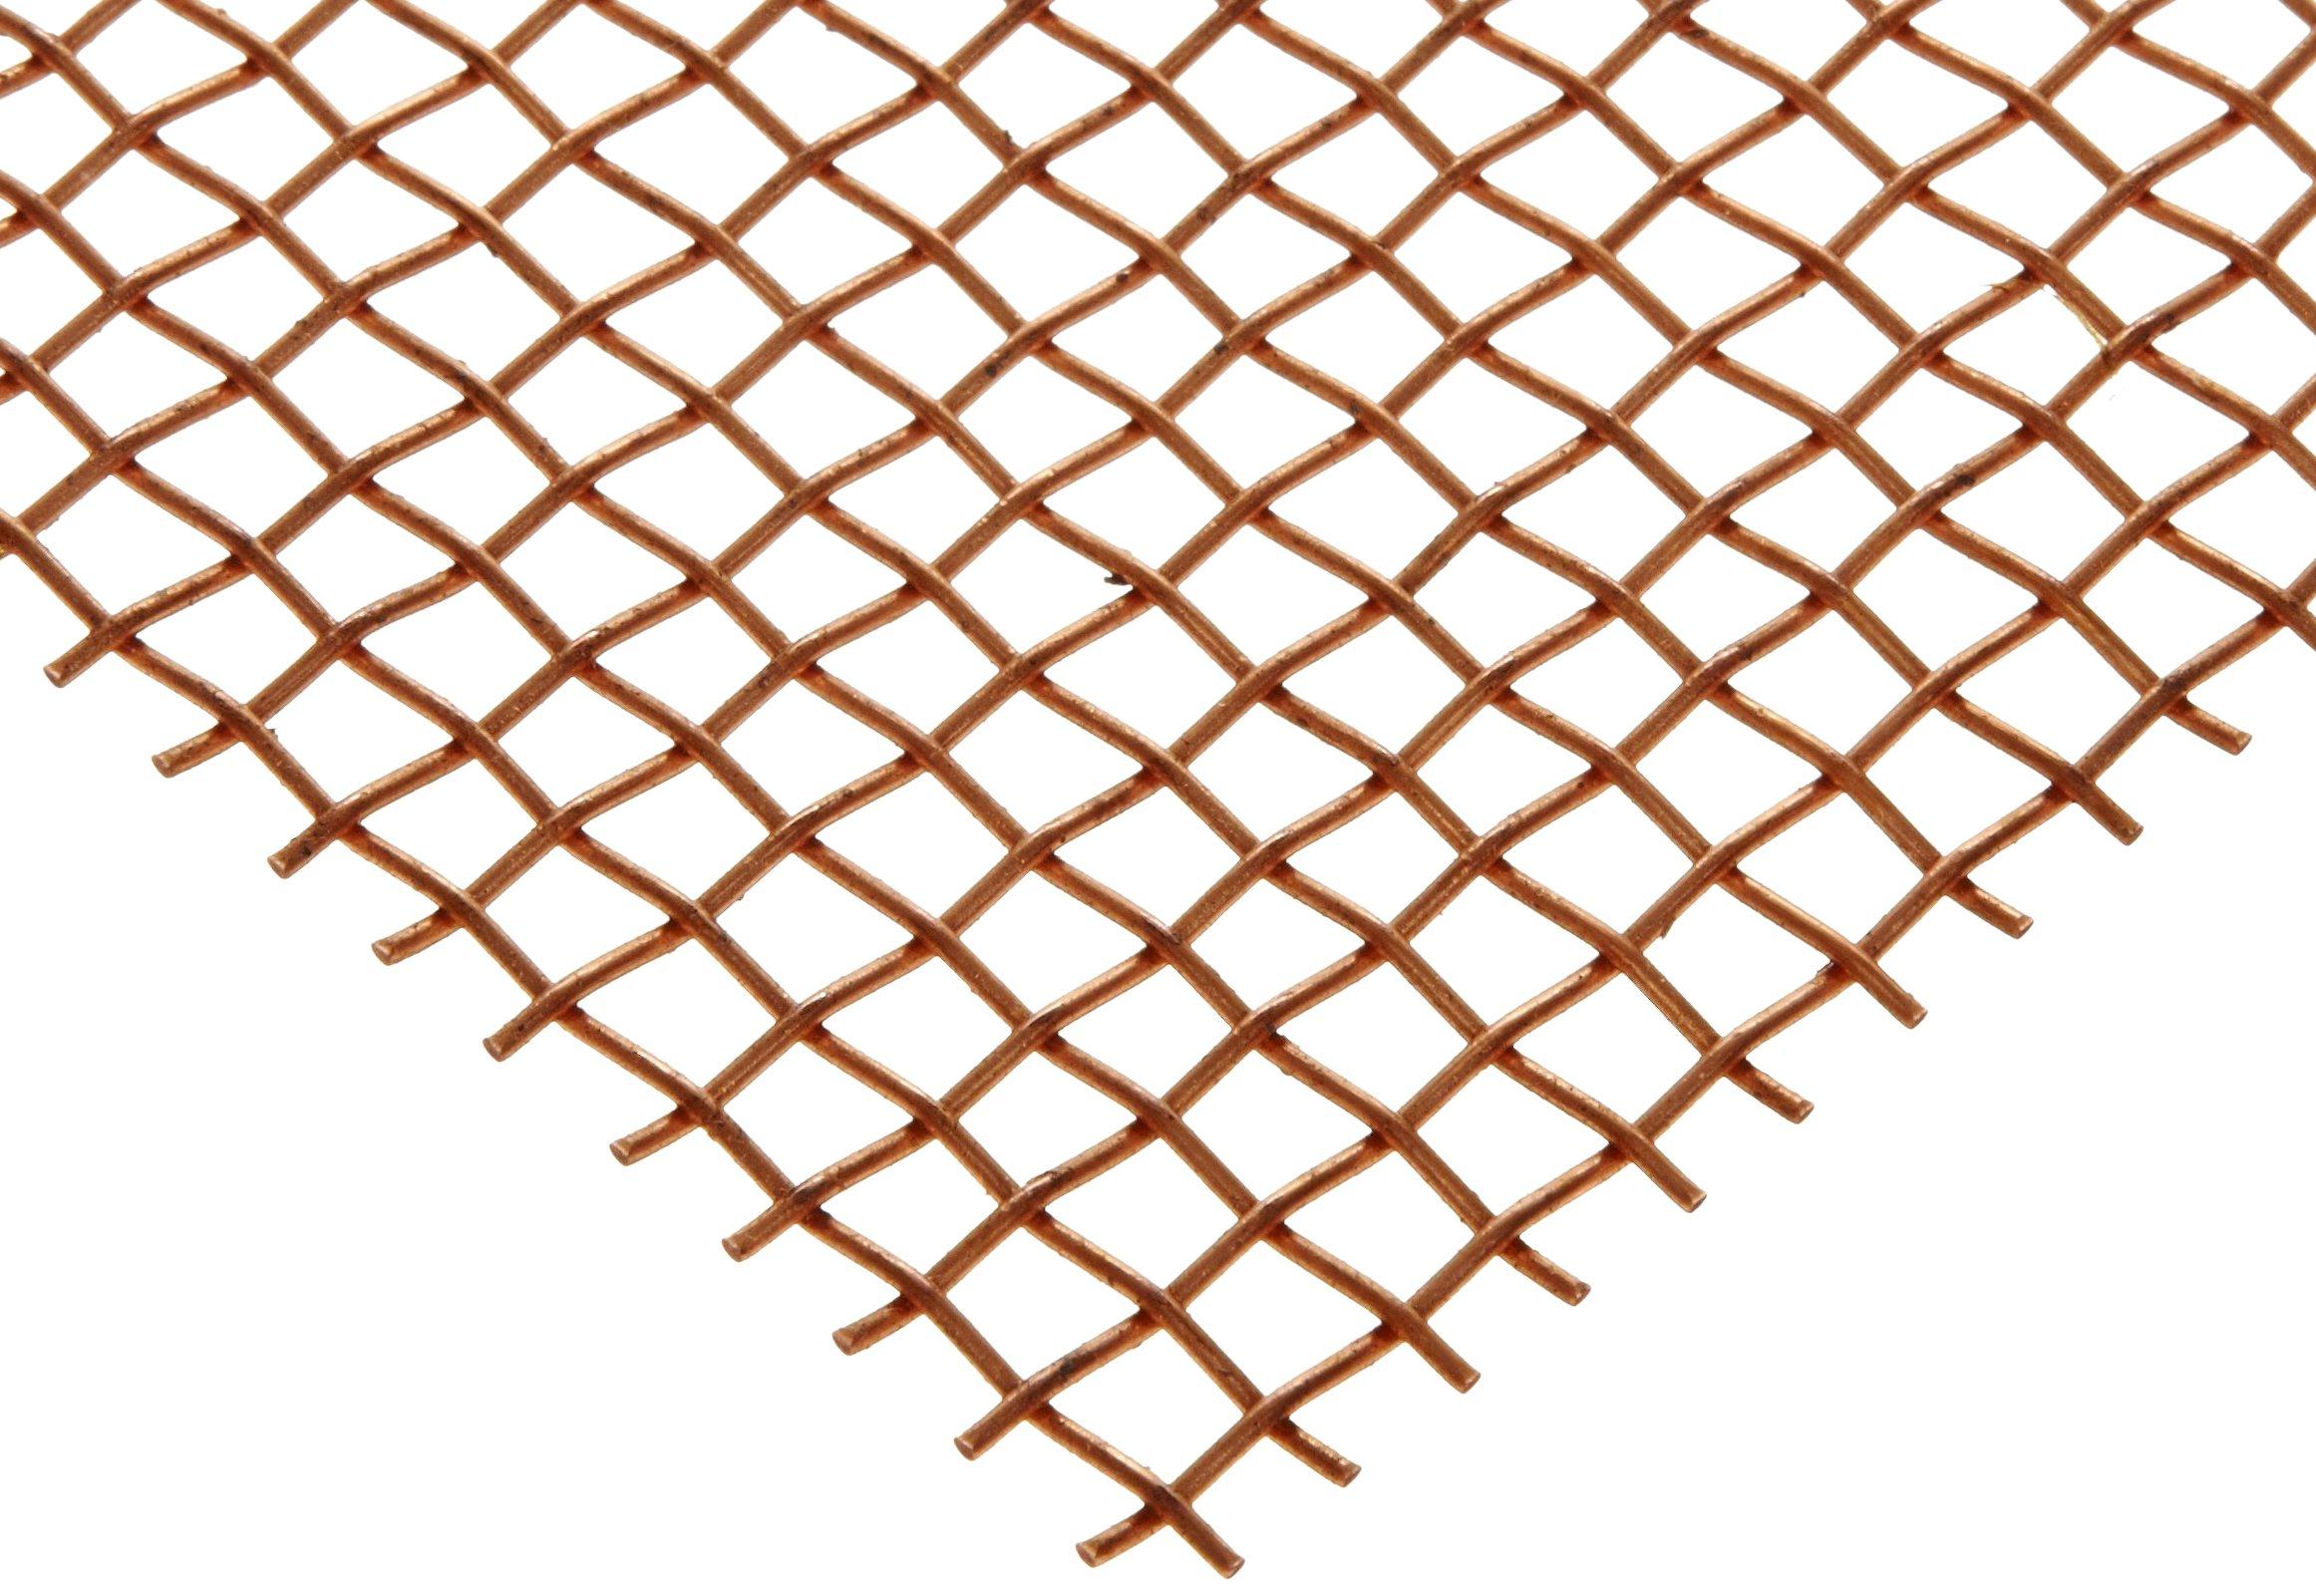 Copper Woven Mesh Sheet, Unpolished (Mill) Finish, ASTM E2016-06, 12'' Width, 24'' Length, 0.0045'' Wire Diameter, 30% Open Area